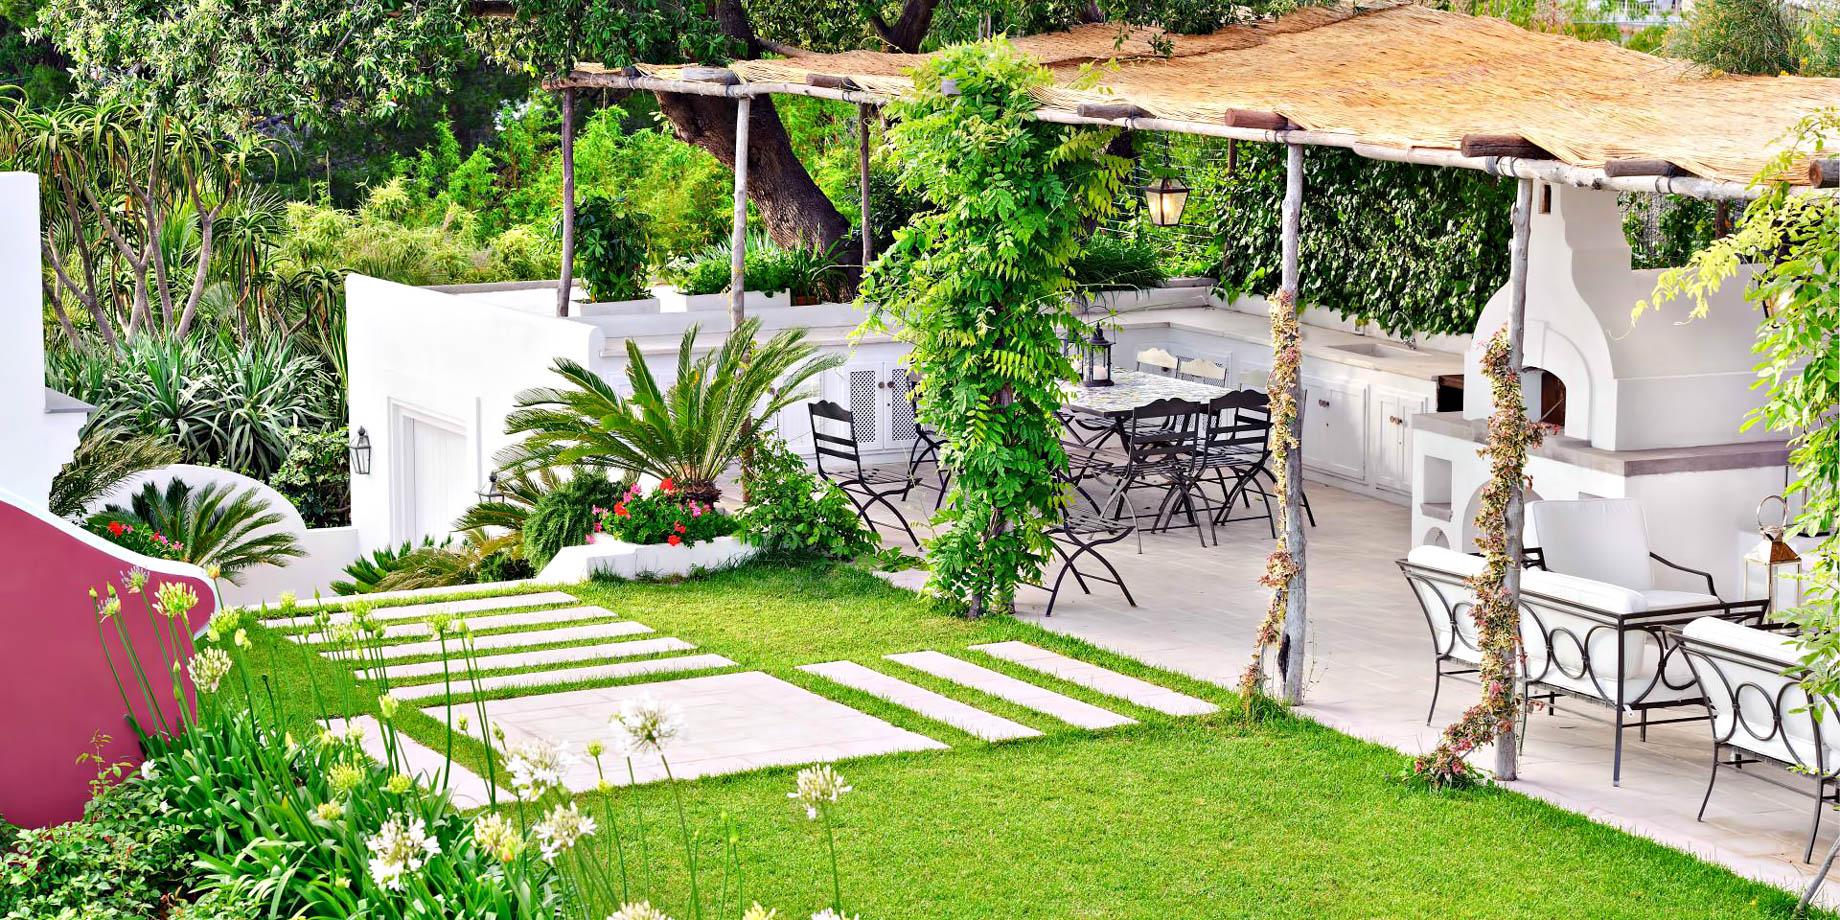 Former 45-Room Hotel Belsito - Villa Ferraro - Capri, Naples, Campania, Italy